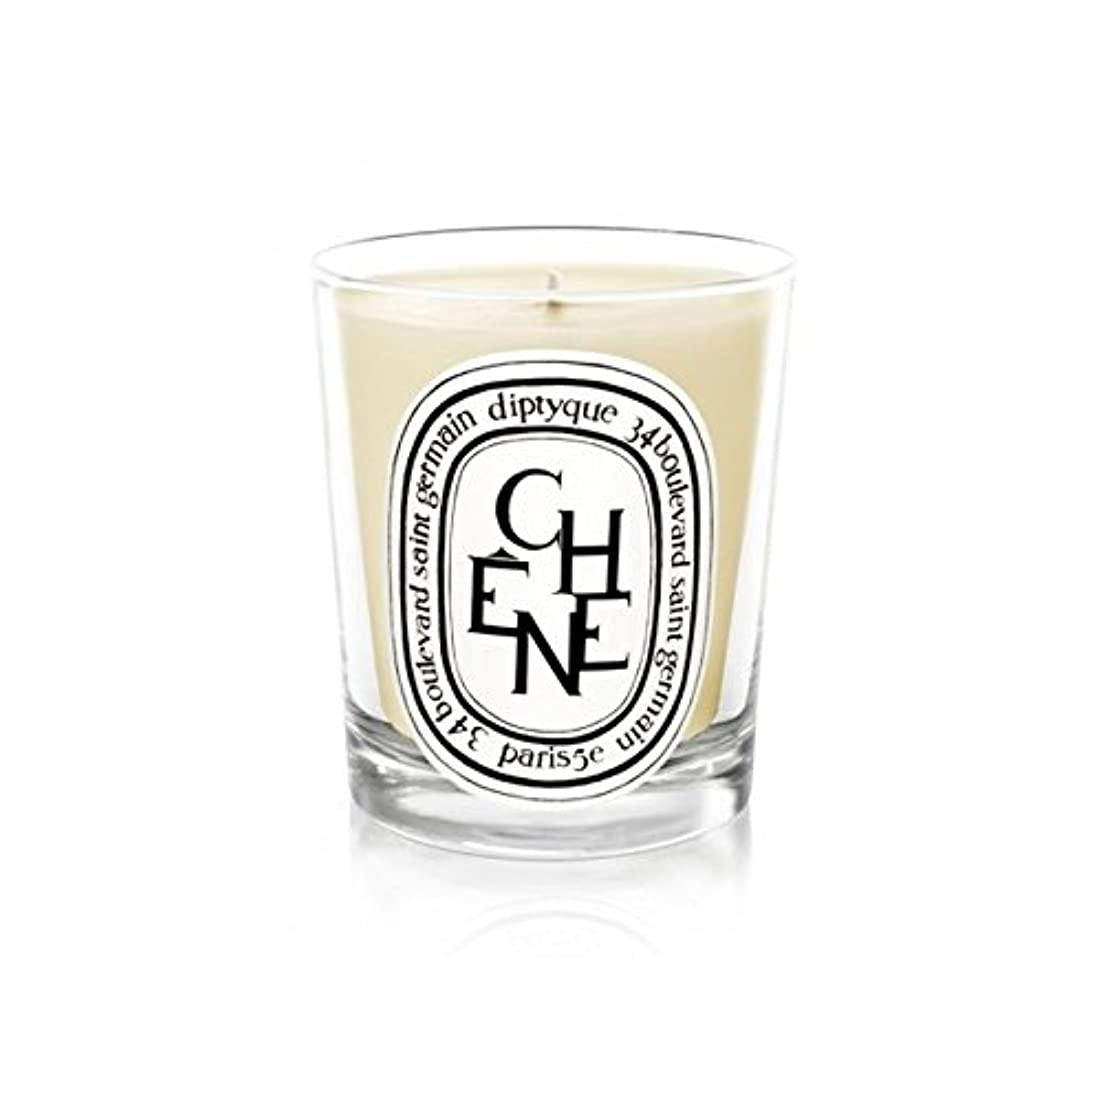 Diptyque Candle Ch??ne / Oak Tree 190g (Pack of 2) - DiptyqueキャンドルCh??Ne/樫の木の190グラム (x2) [並行輸入品]